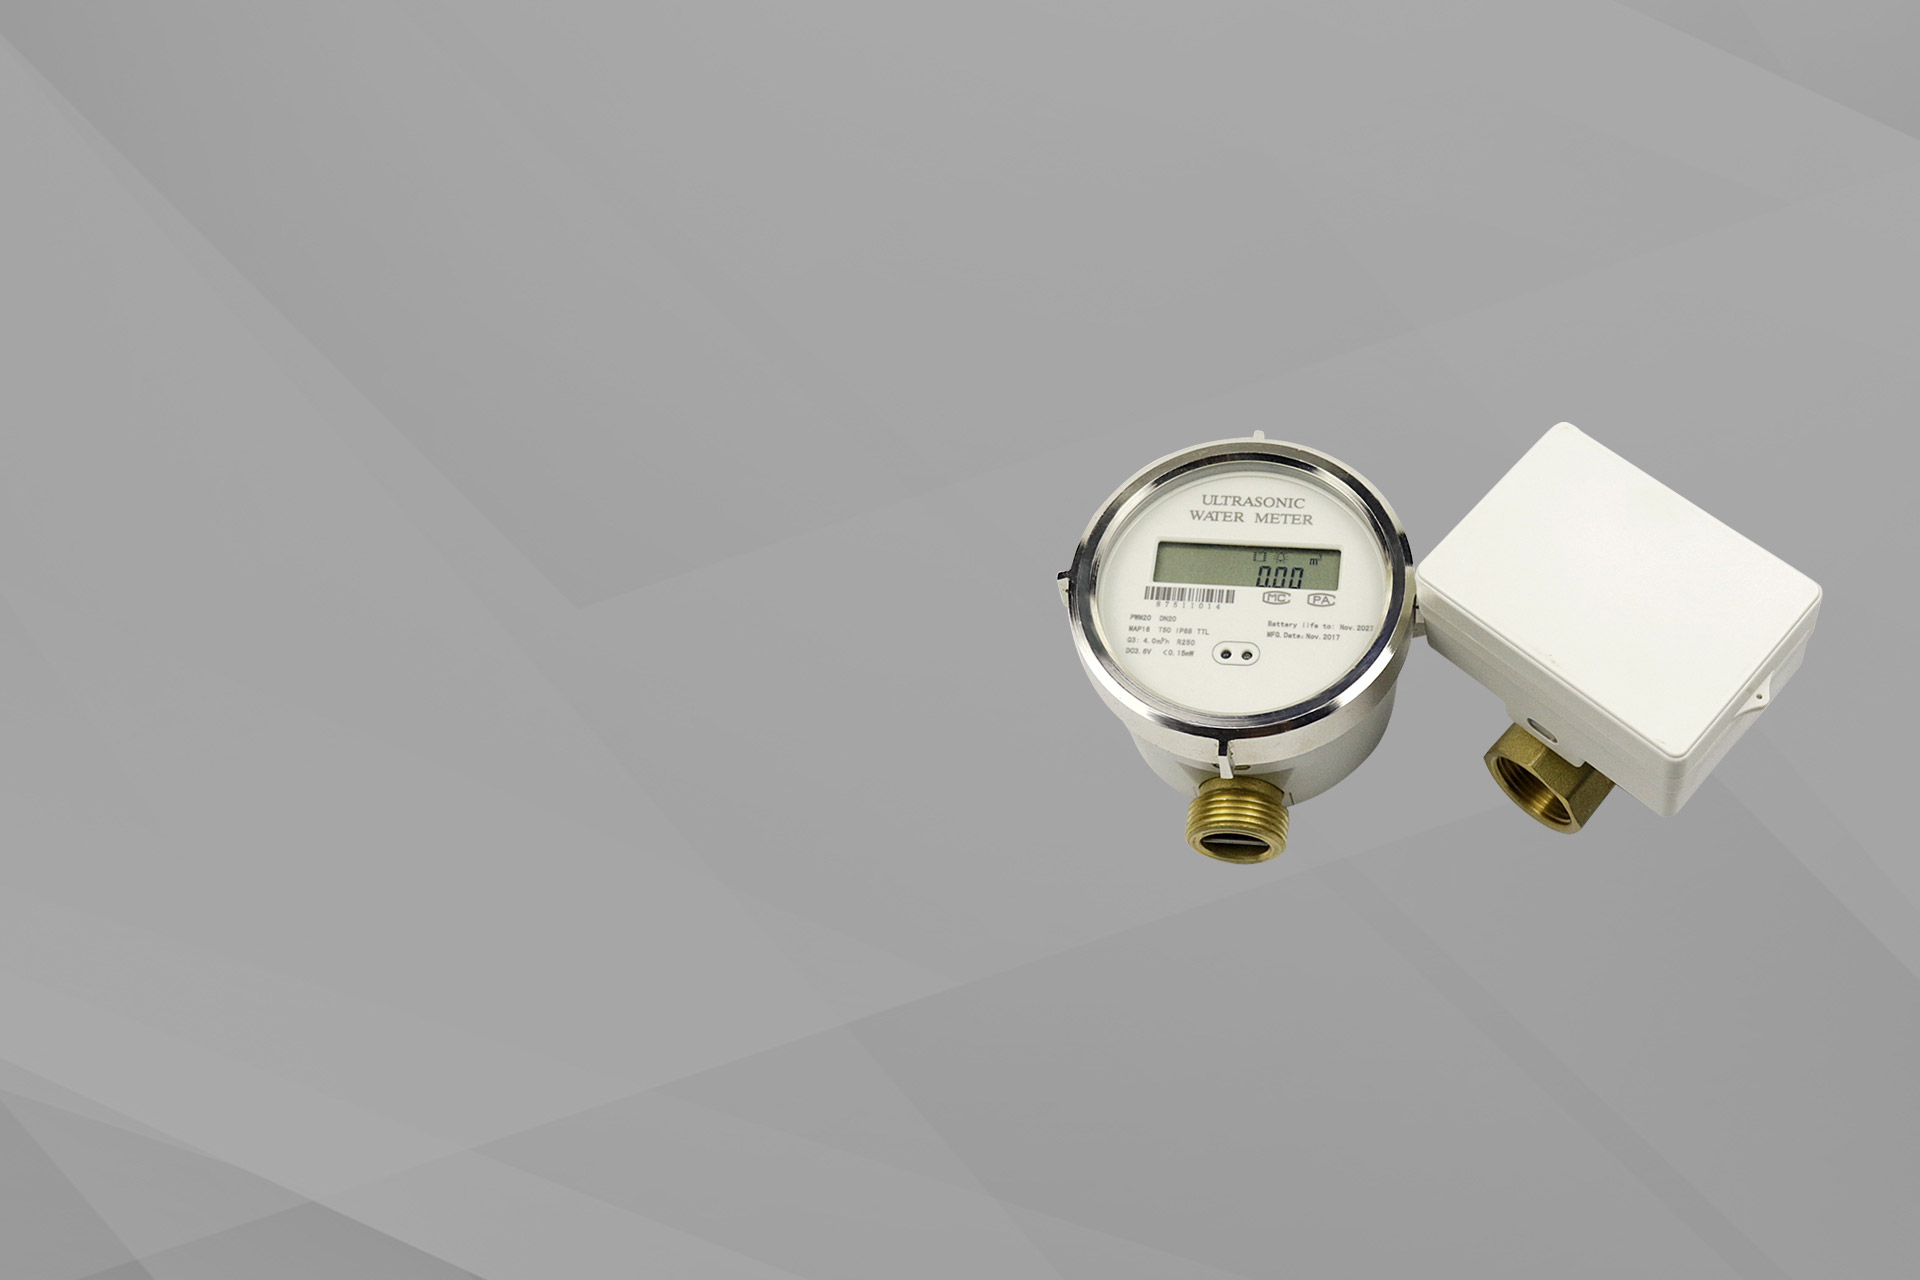 CnIrHurricane | Manufacturer of Ultrasonic Flow Meters